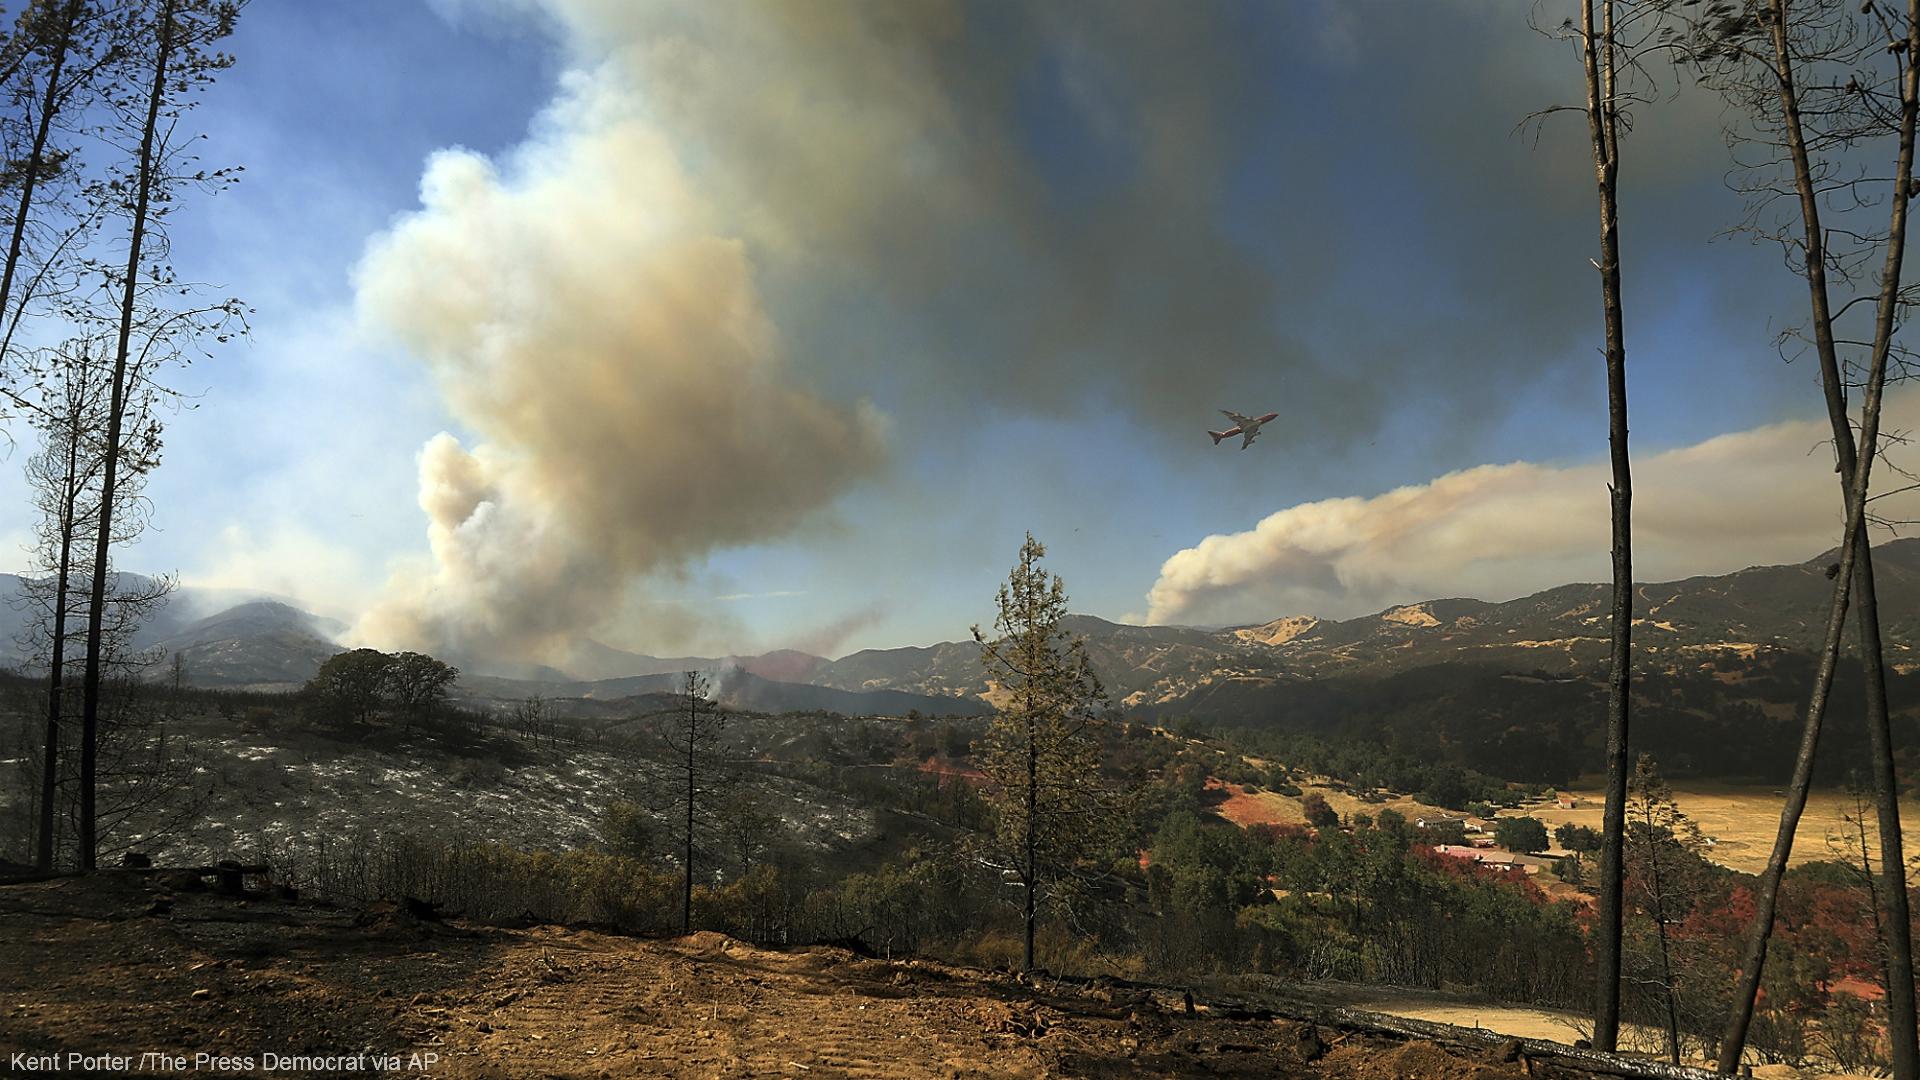 california wildfire scotts valley 080318 AP_1533521373101.jpg.jpg